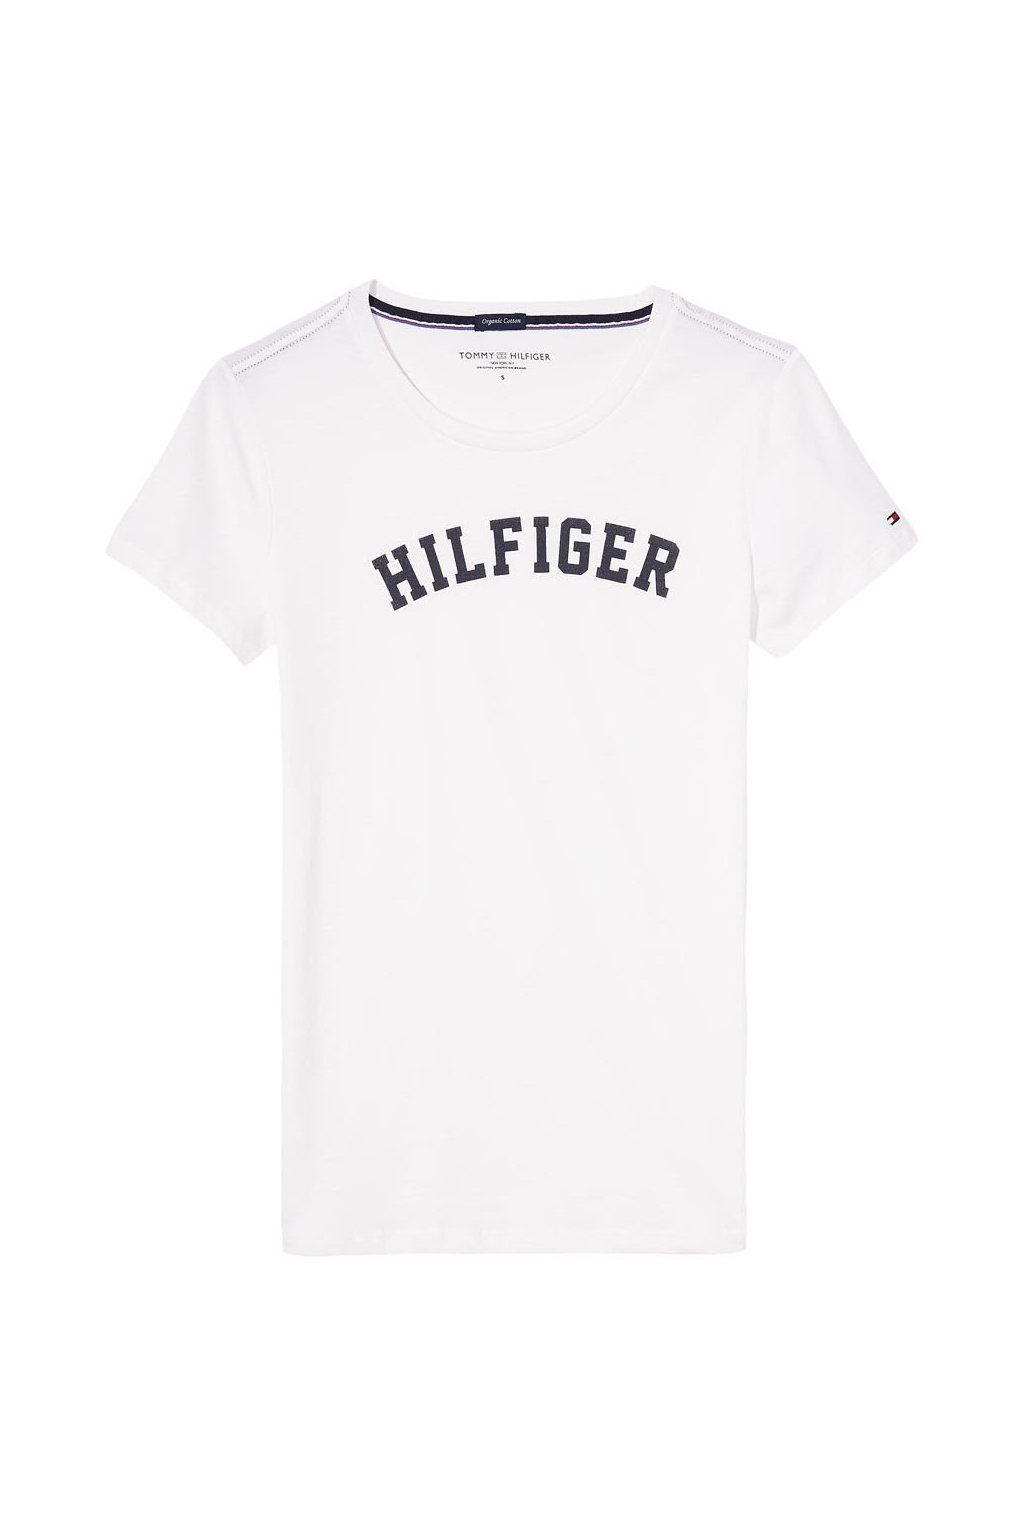 tommy hilfiger logo print t shirt 2